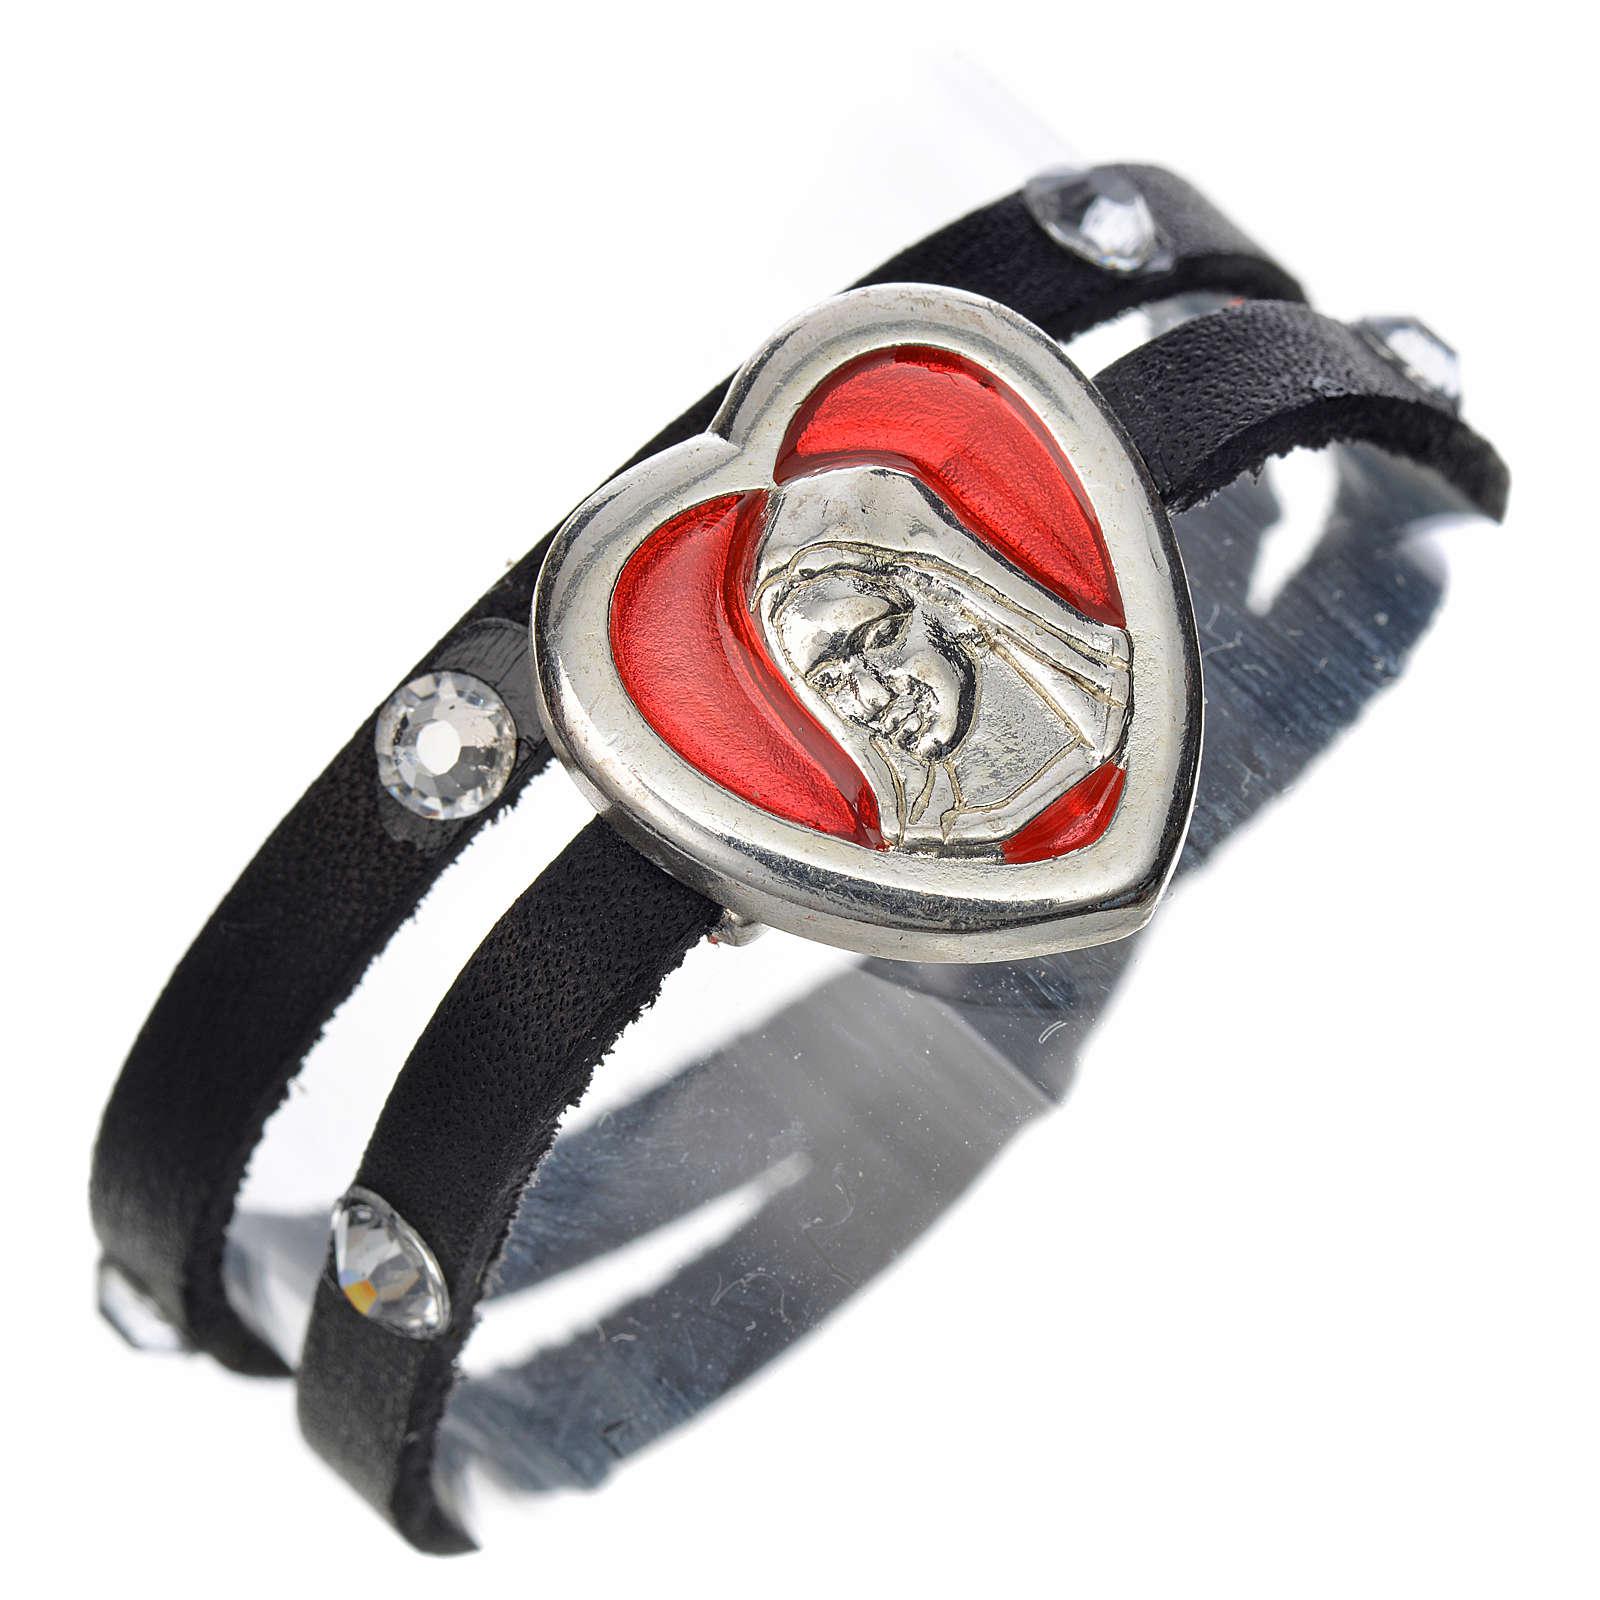 Bracelet black leather, Swarovski Virgin Mary pendant red enamel 4